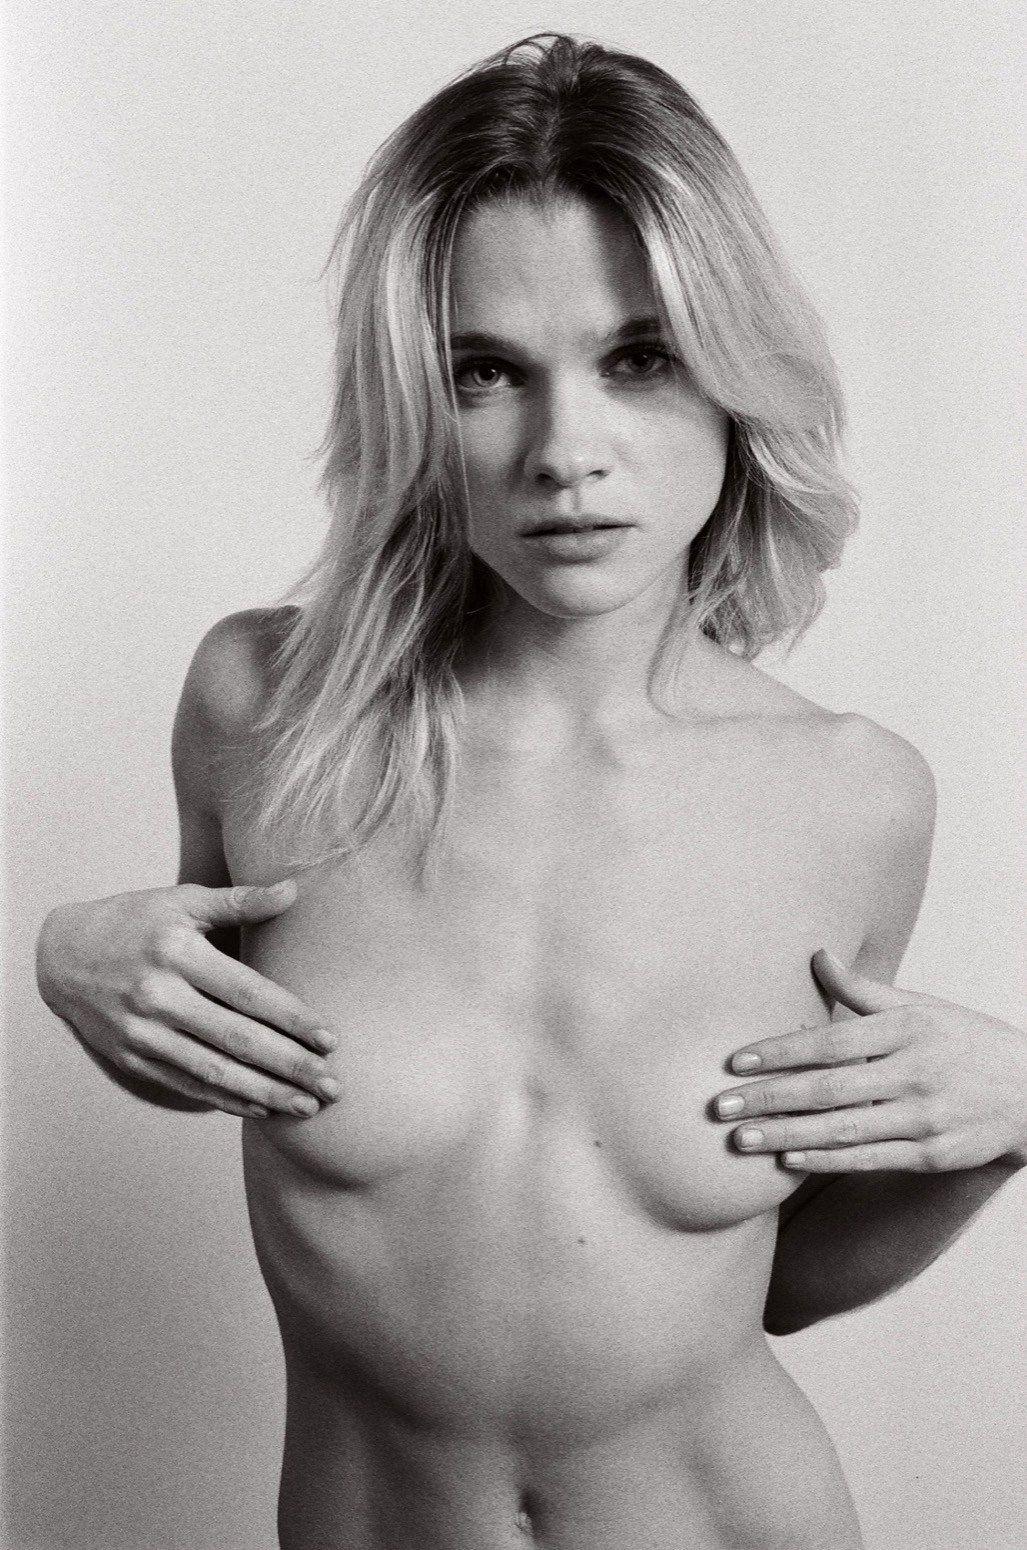 Jena davidson porn star